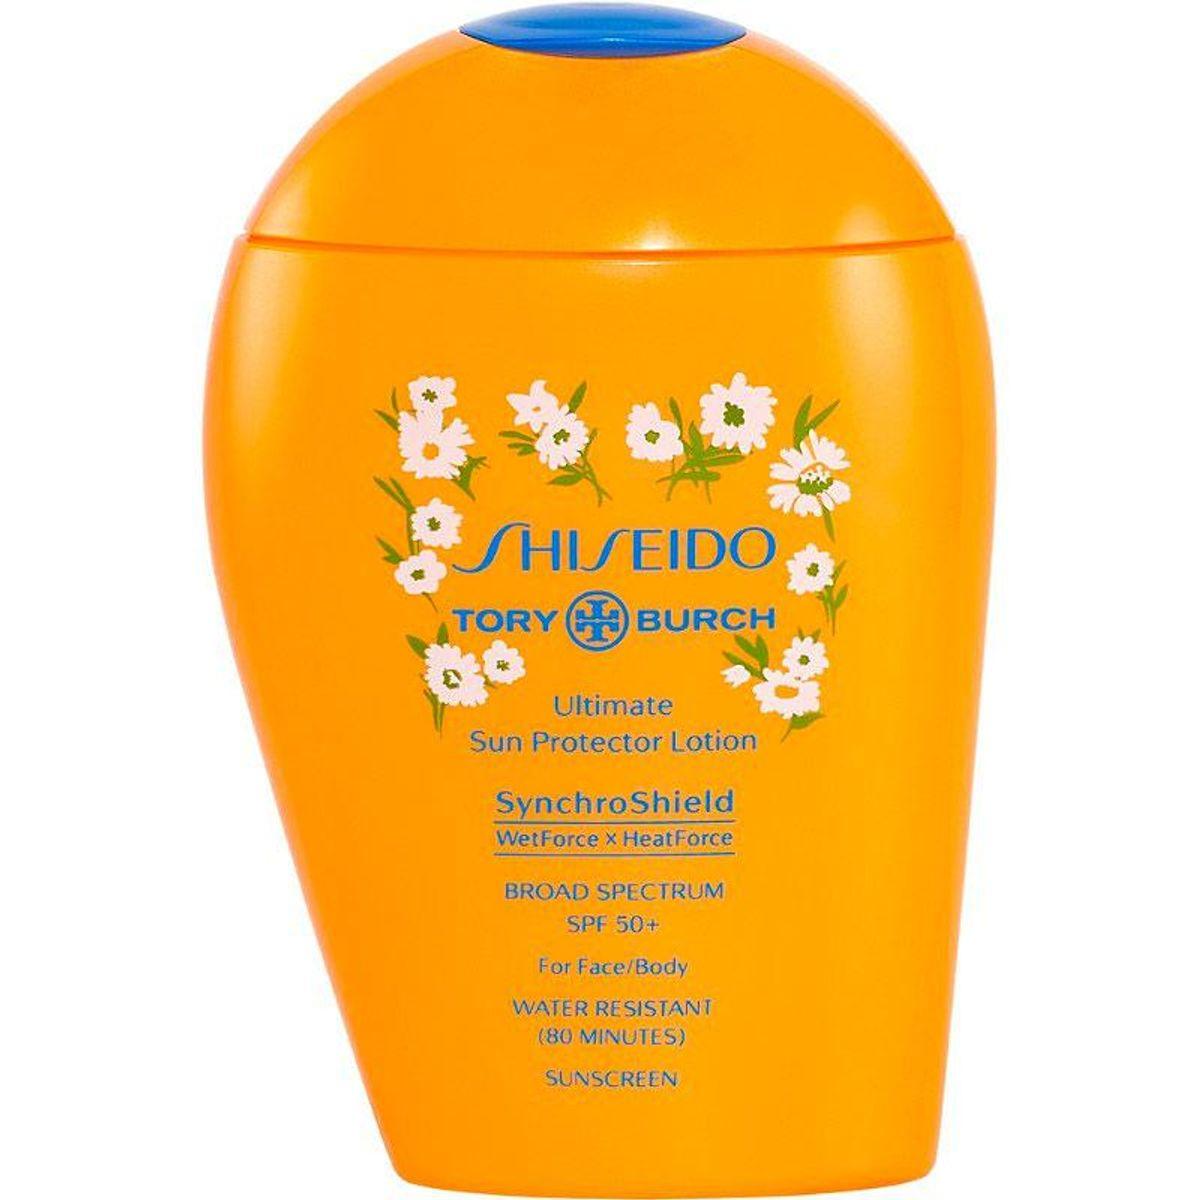 shiseido x tory burch ultimate sun protector lotion spf 50 plus sunscreen